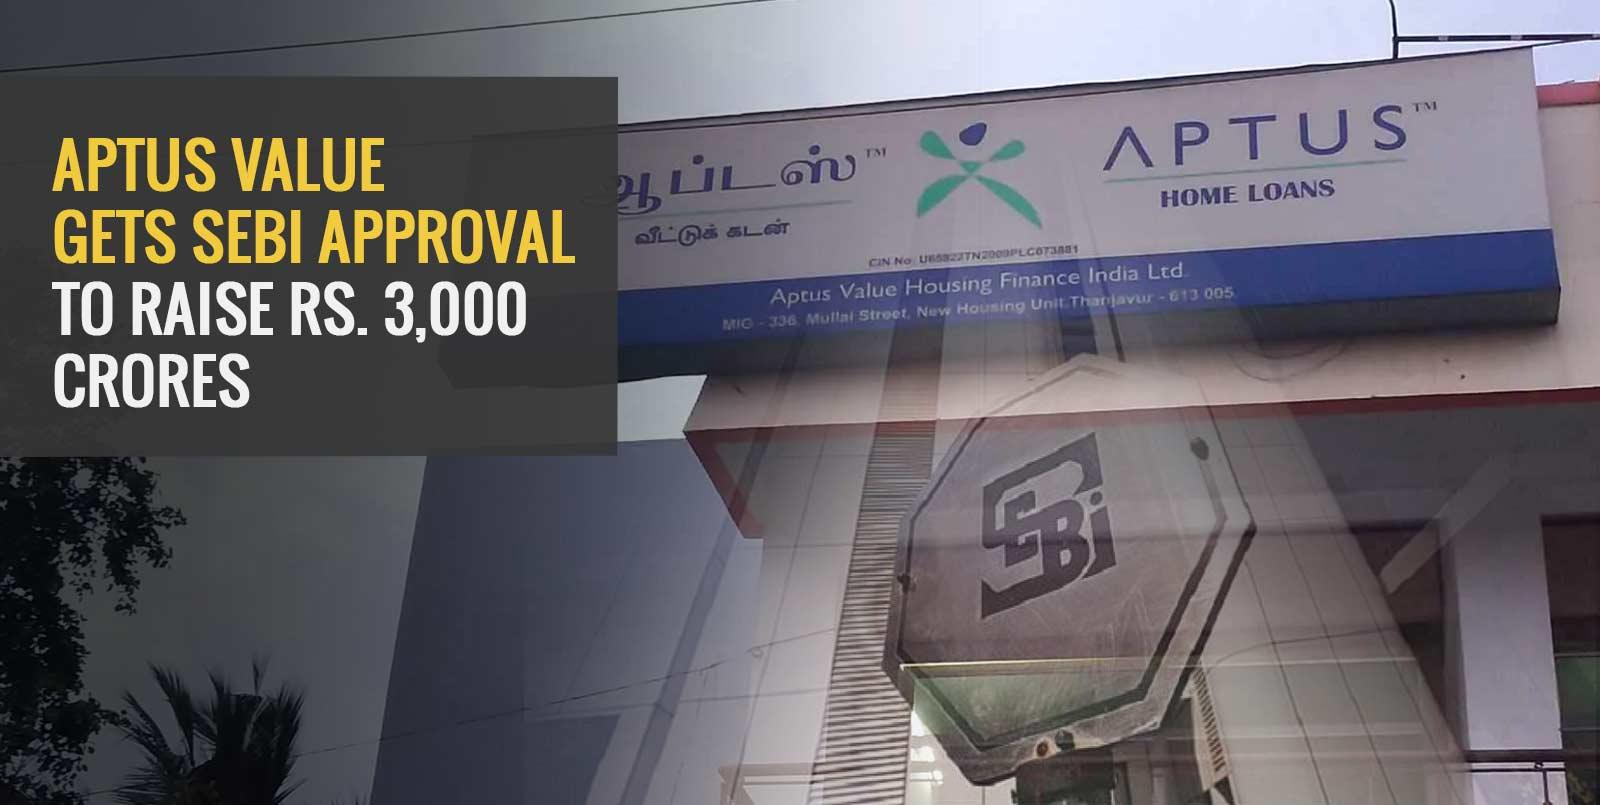 Aptus Value Gets SEBI Approval to Raise Rs. 3,000 Crores